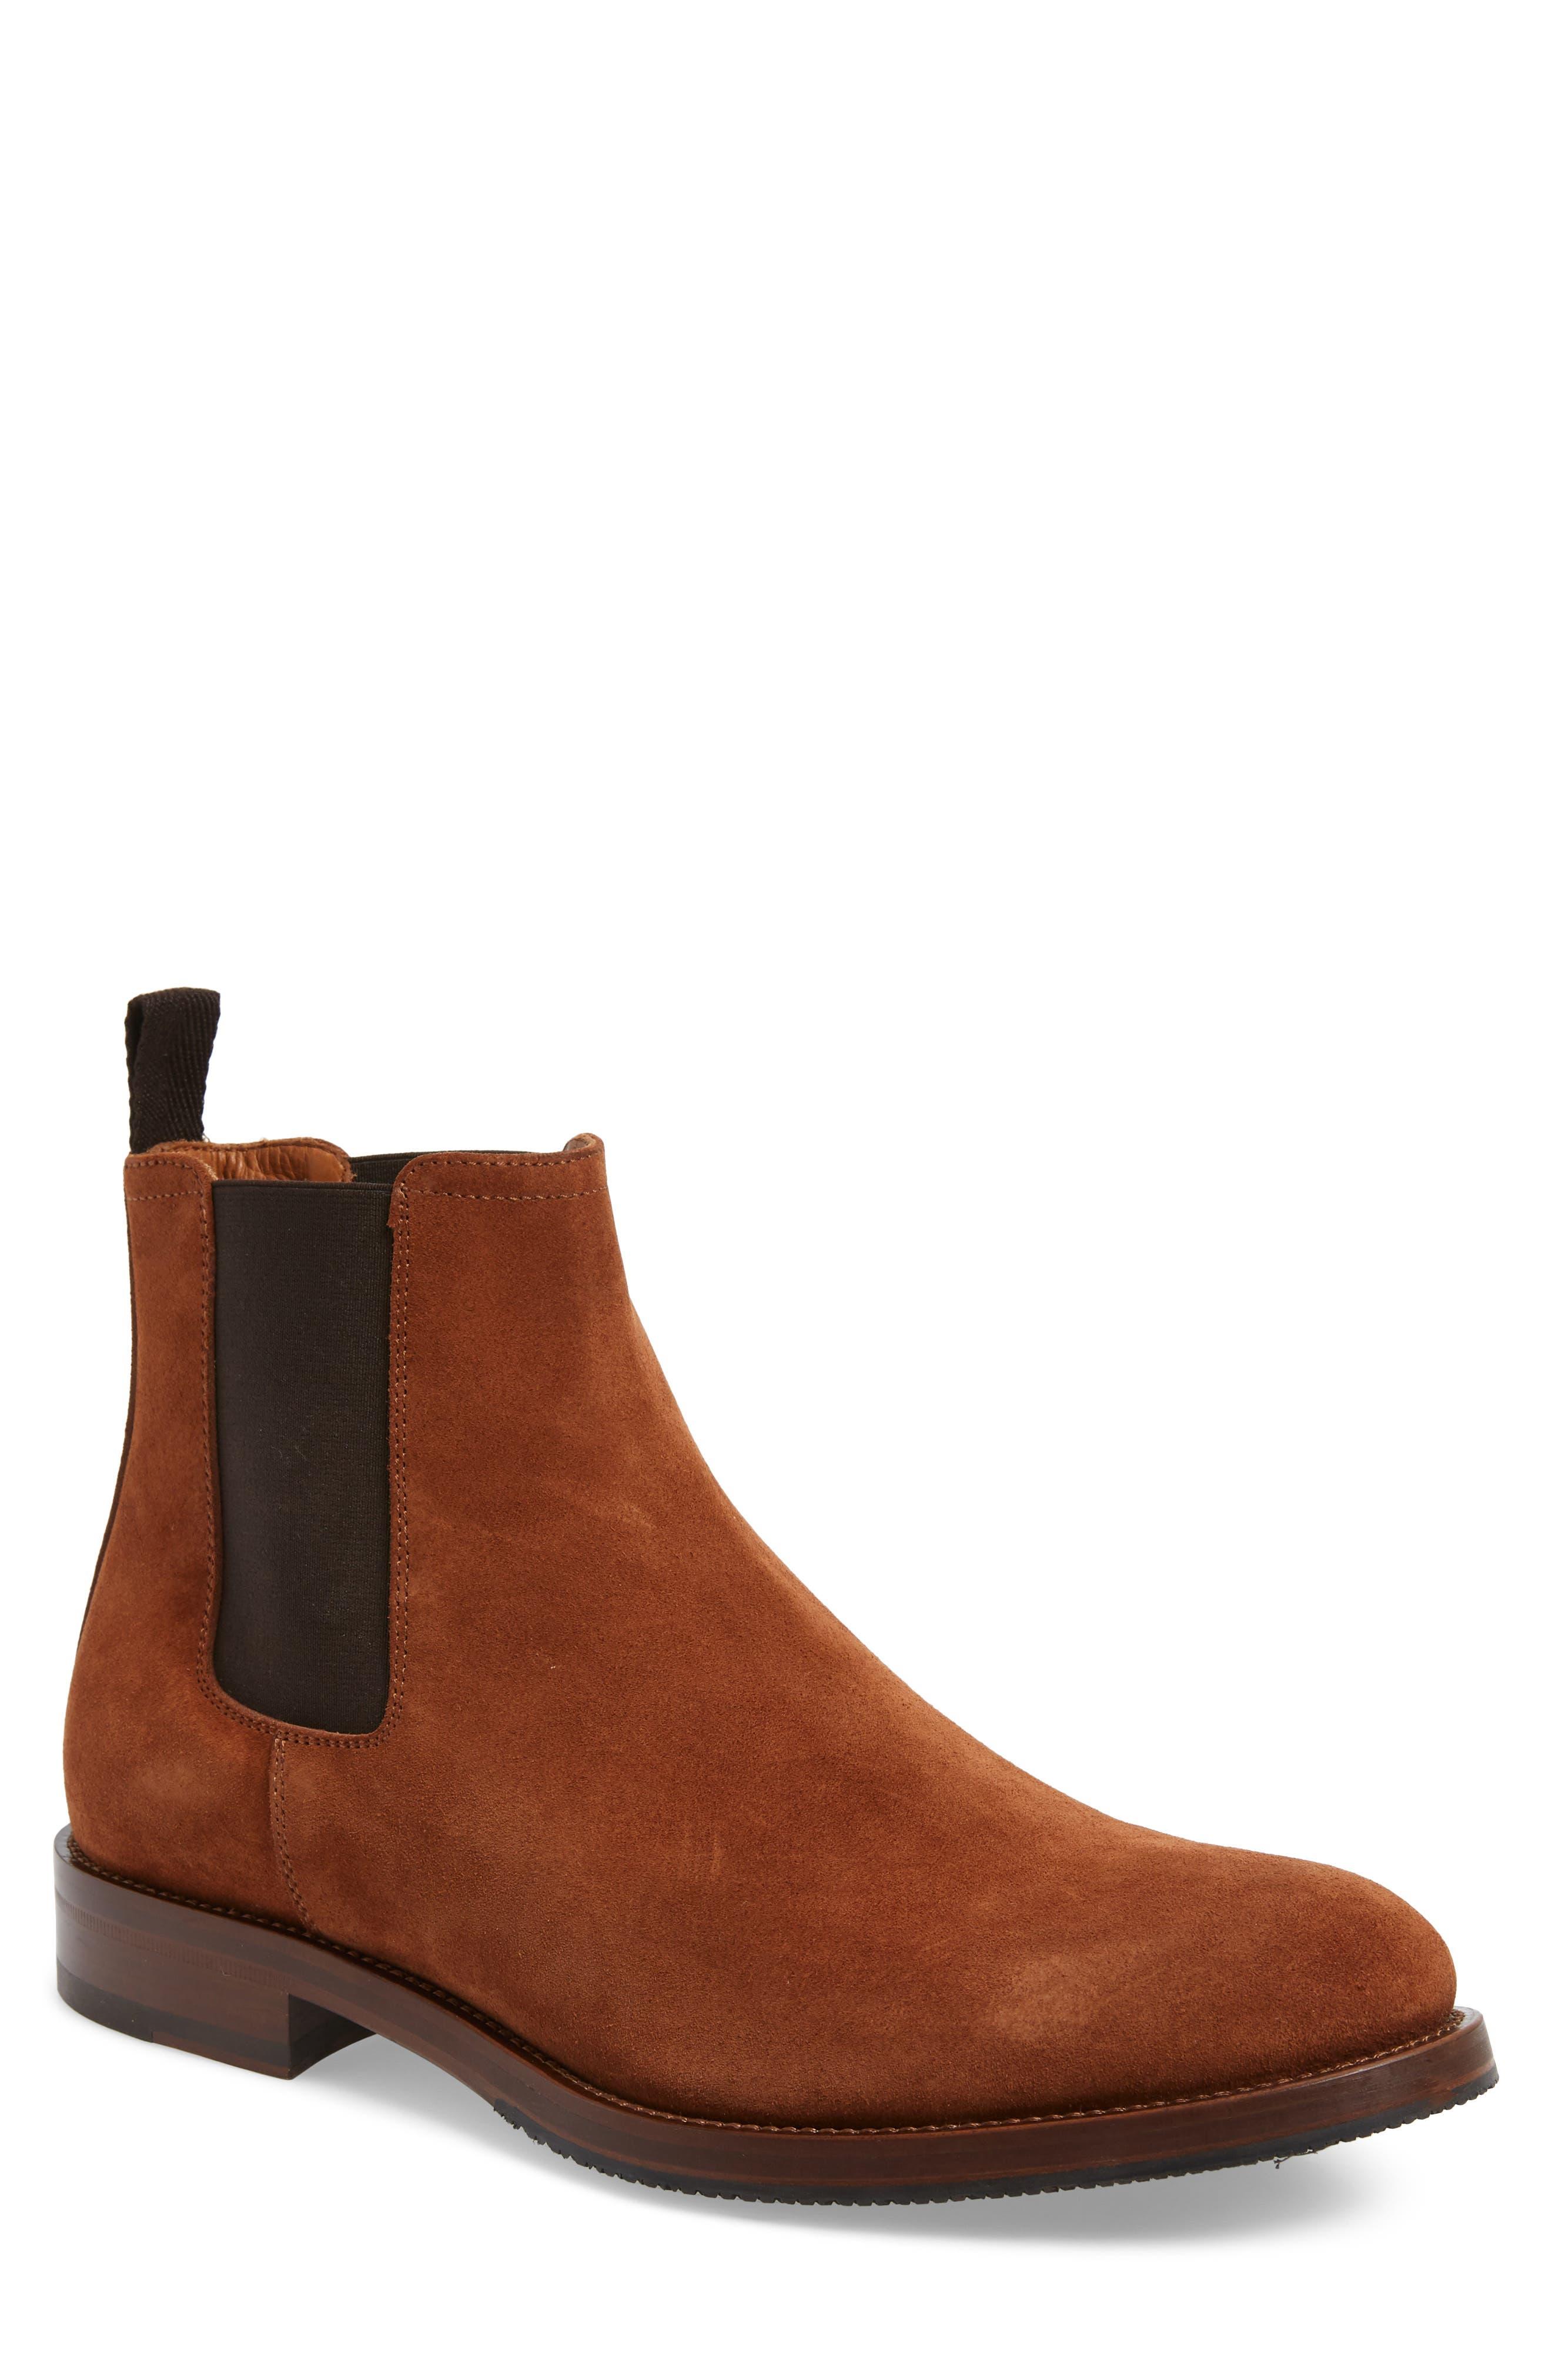 Aquatalia Giancarlo Weatherproof Chelsea Boot, Brown